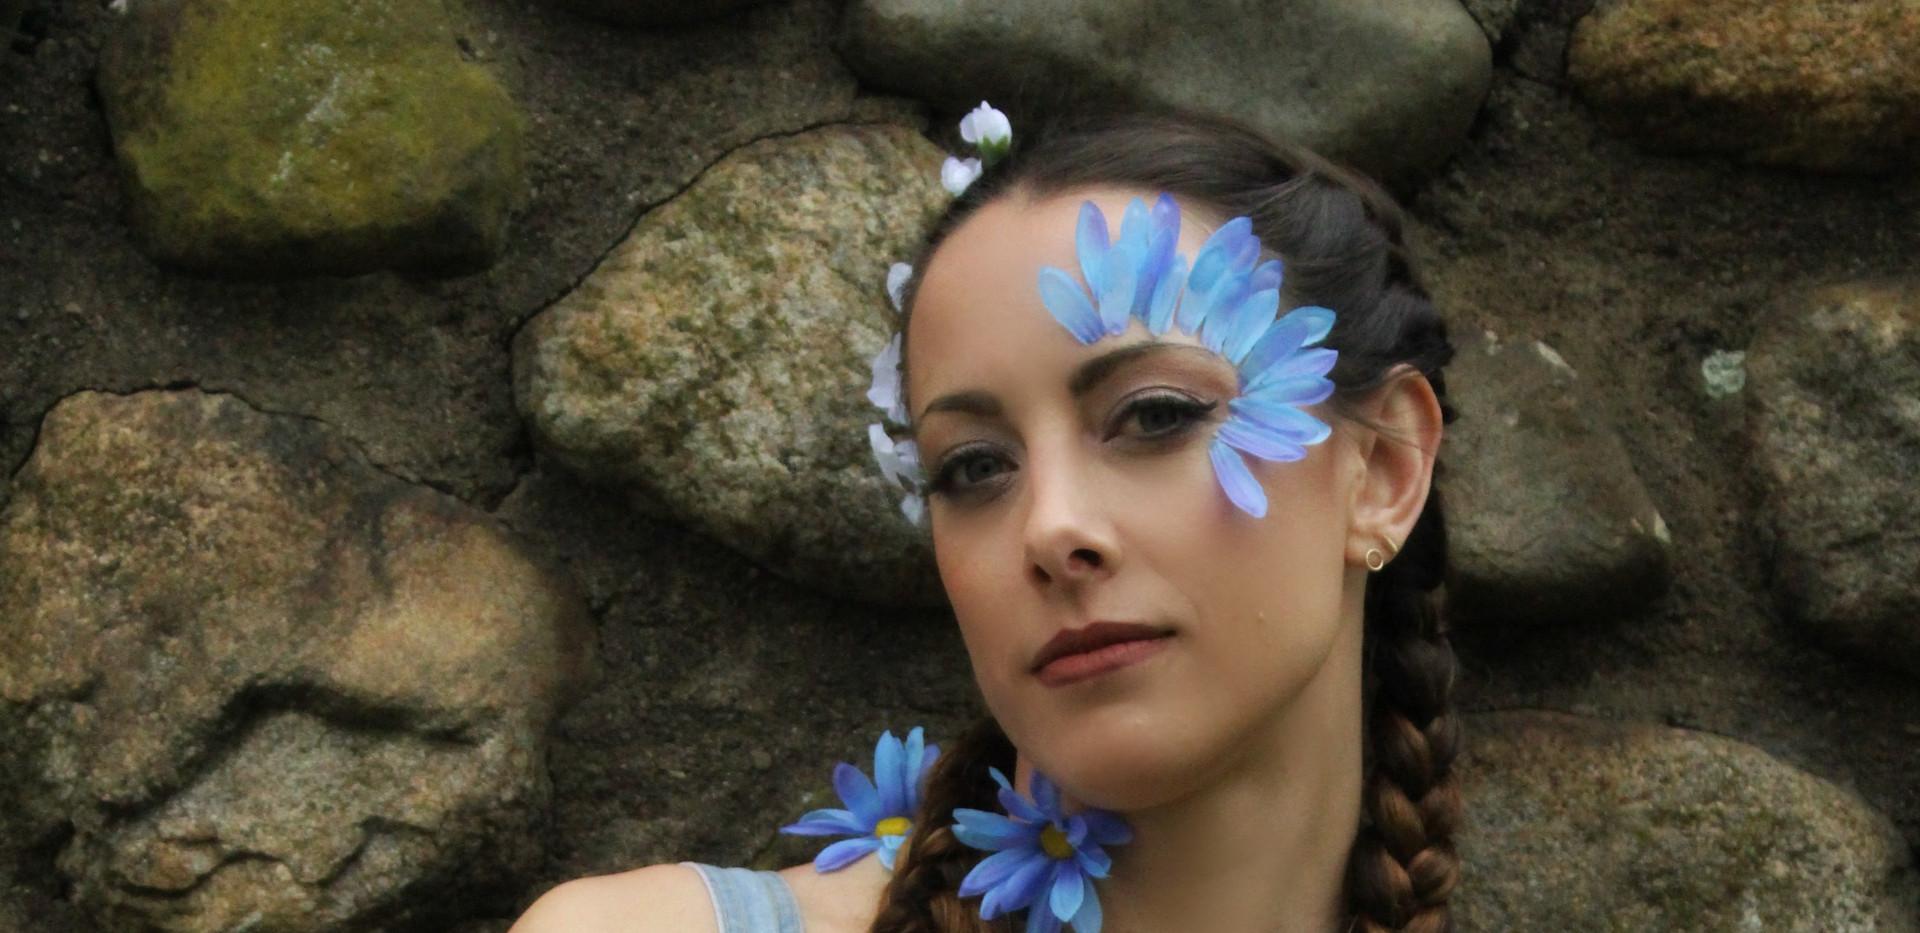 @daniellekwoka for May's Floral Collab Photo: @mariannebphotography Makeup: @lipstickandmagictricks